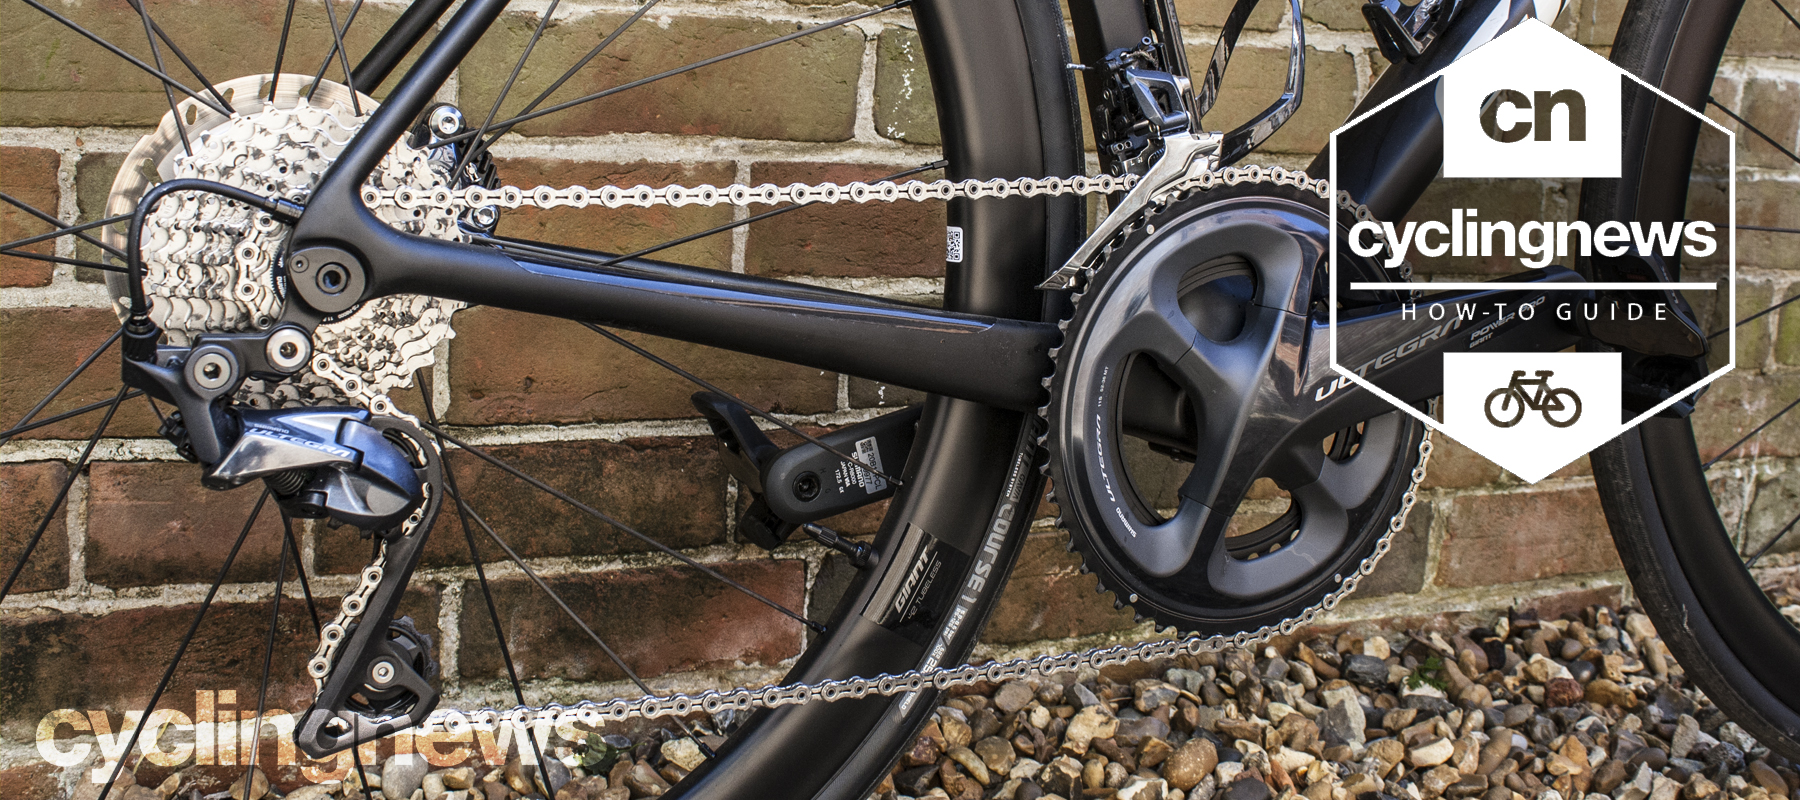 UK/_ Bike Hand Master Link Plier Chain Clamp Removal Repair Tool Road Bicycle Net